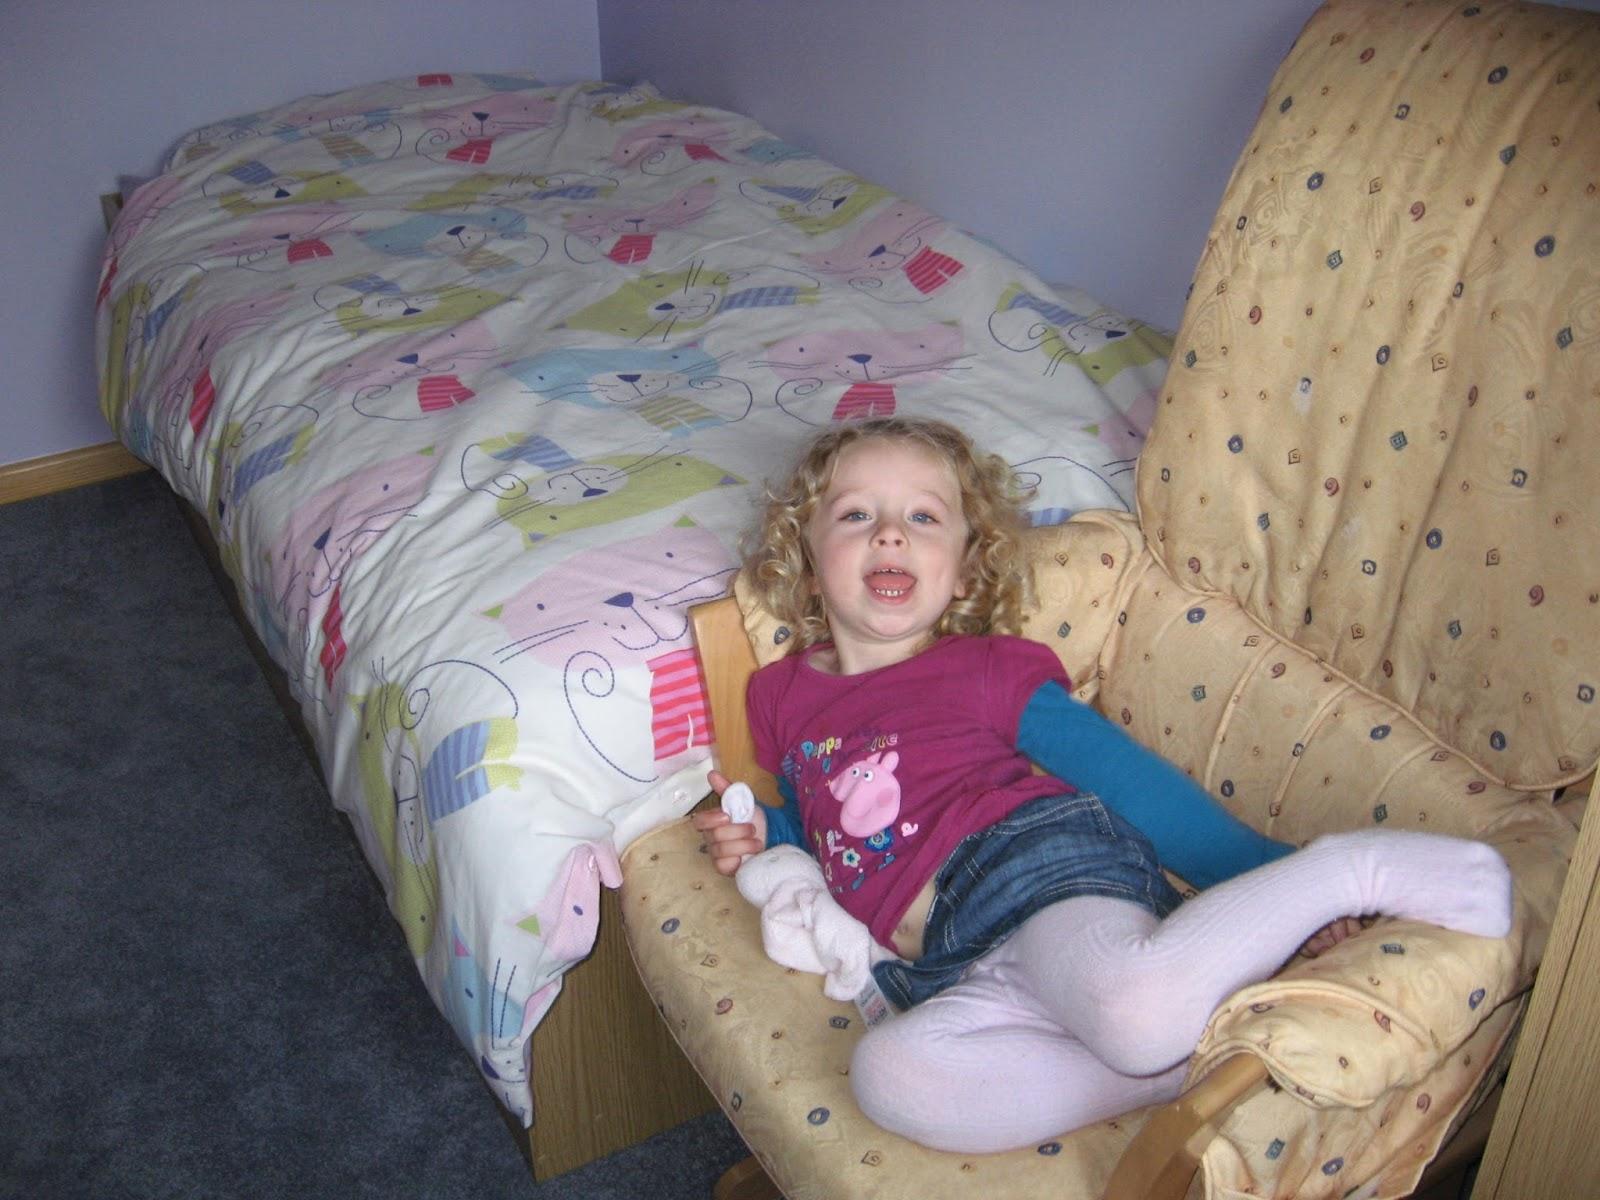 Baby girl streakerpicmagic periscope vichatter omegle